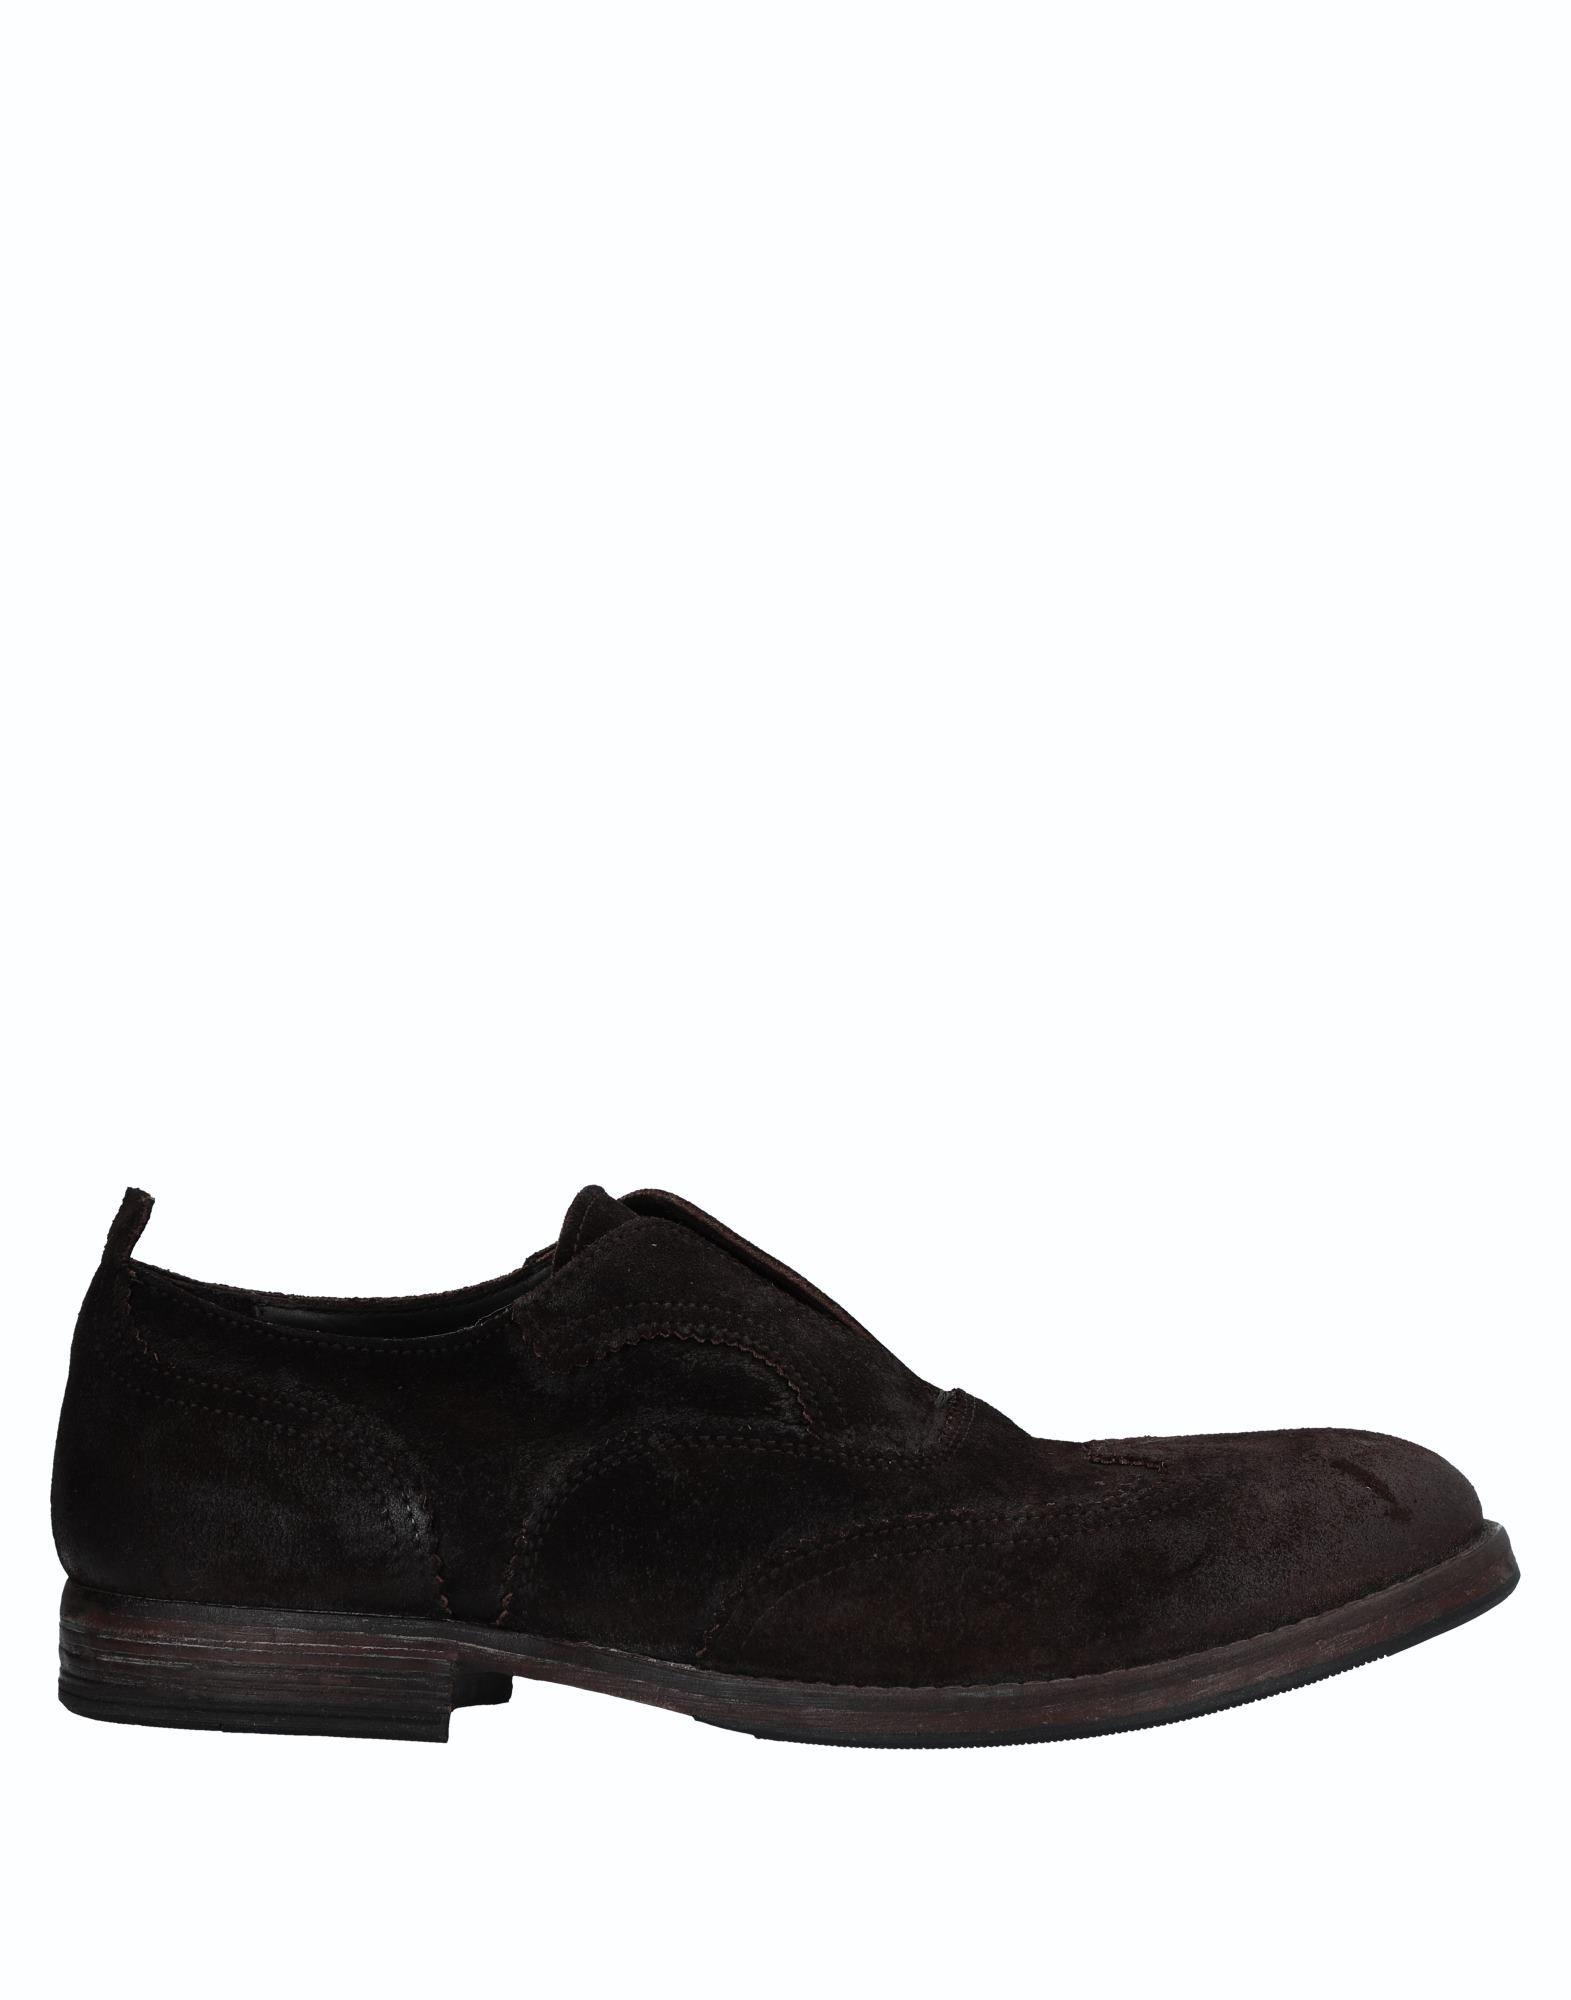 Moma Mokassins Herren  11518672QQ Gute Qualität beliebte Schuhe